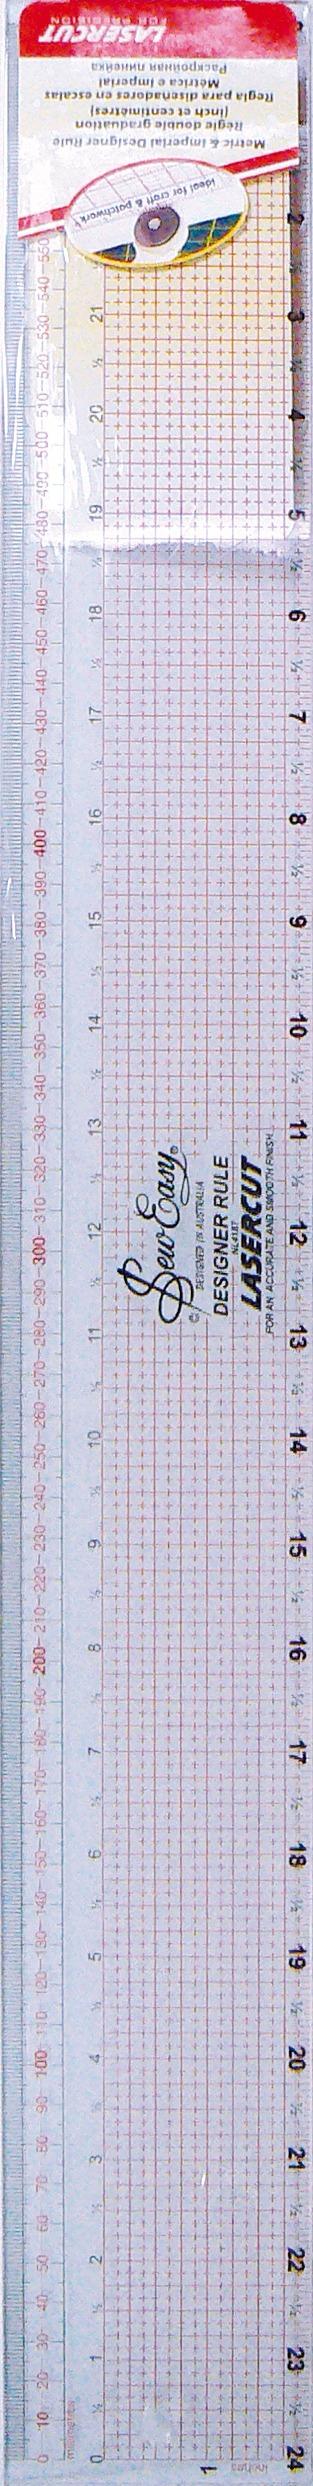 Regle sew easy 61 cm. / 24 inch